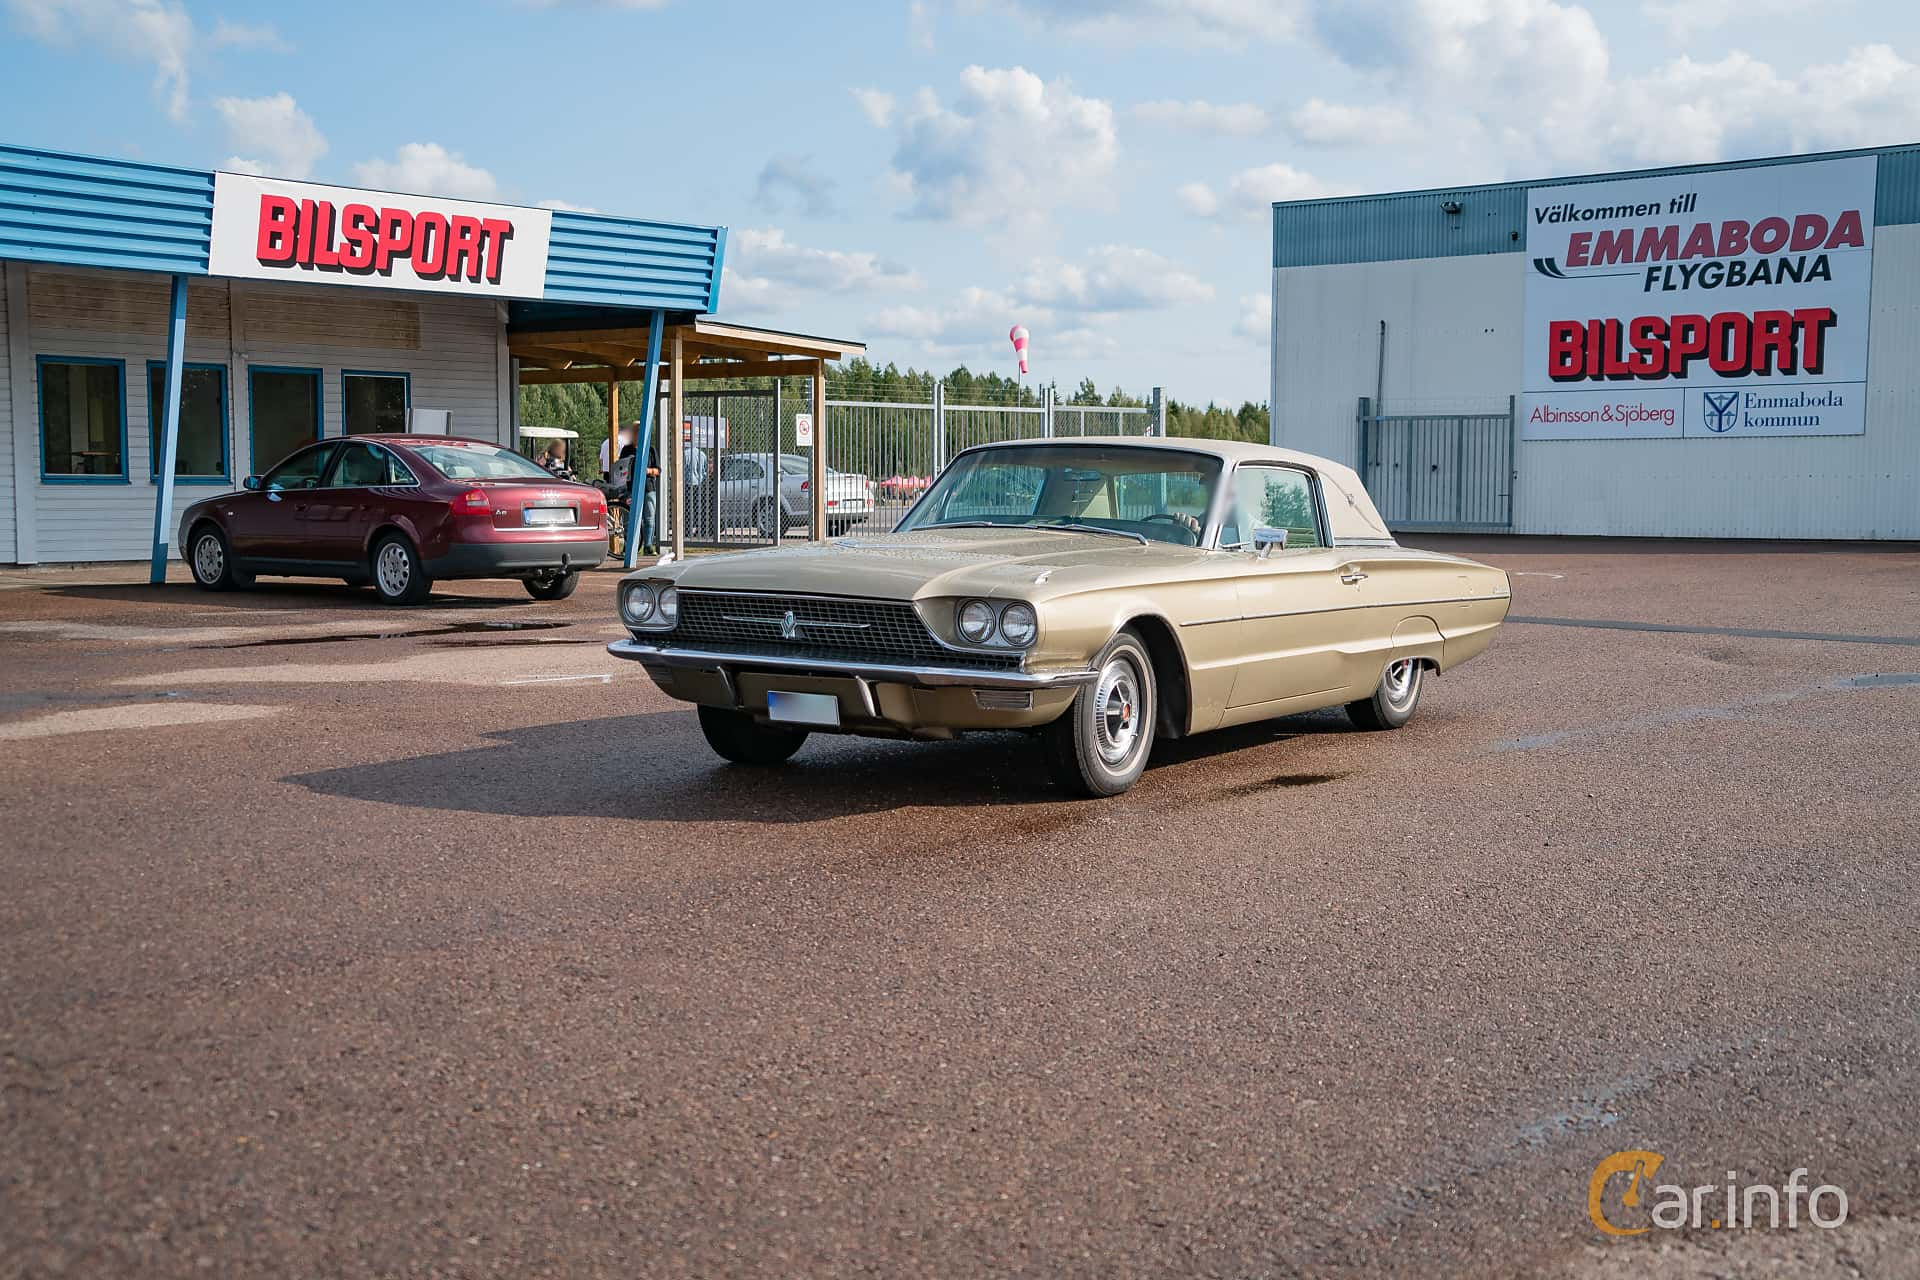 Ford Thunderbird Hardtop 6.4 V8 Automatic, 305hp, 1966 at Power End of Summer Meet Emmaboda 2018